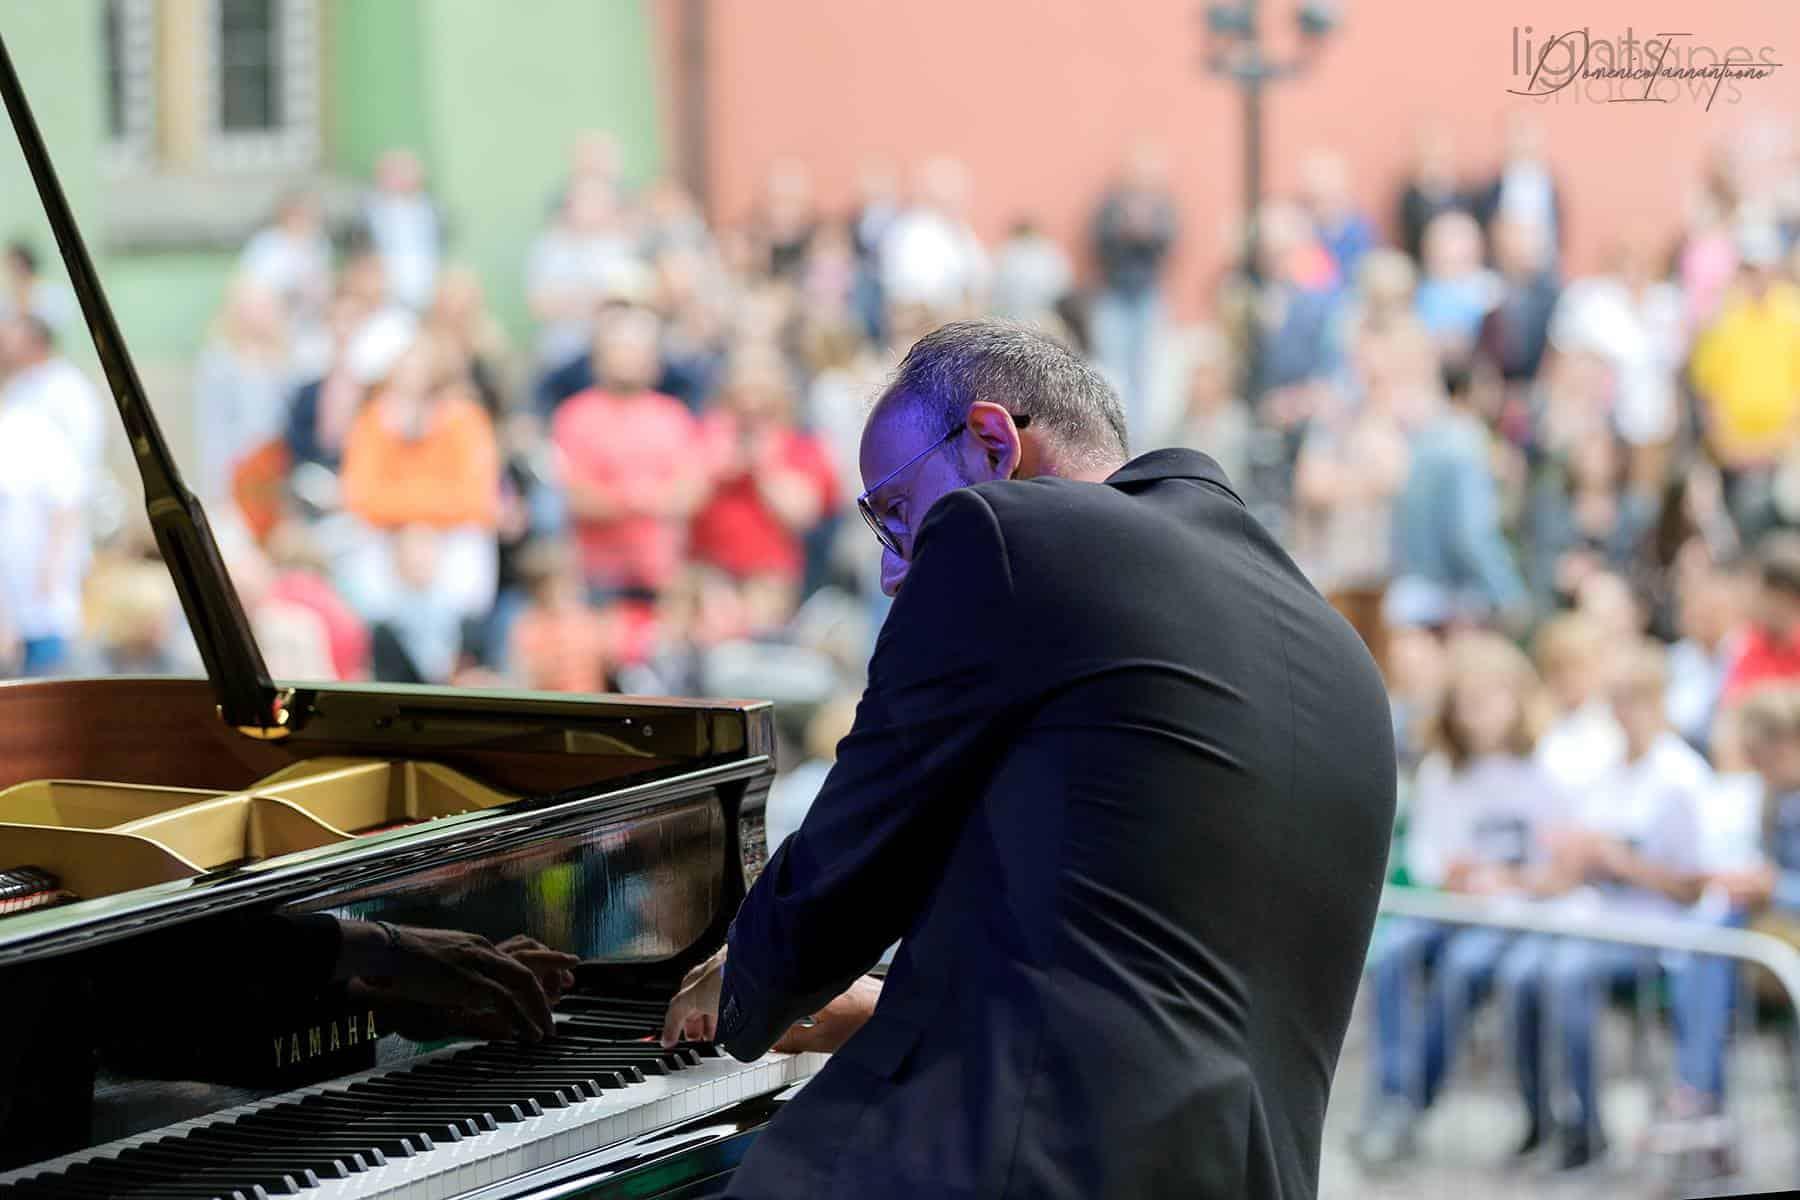 Krakow Summer Jazz Festival 2018 | Pasquale Stafano